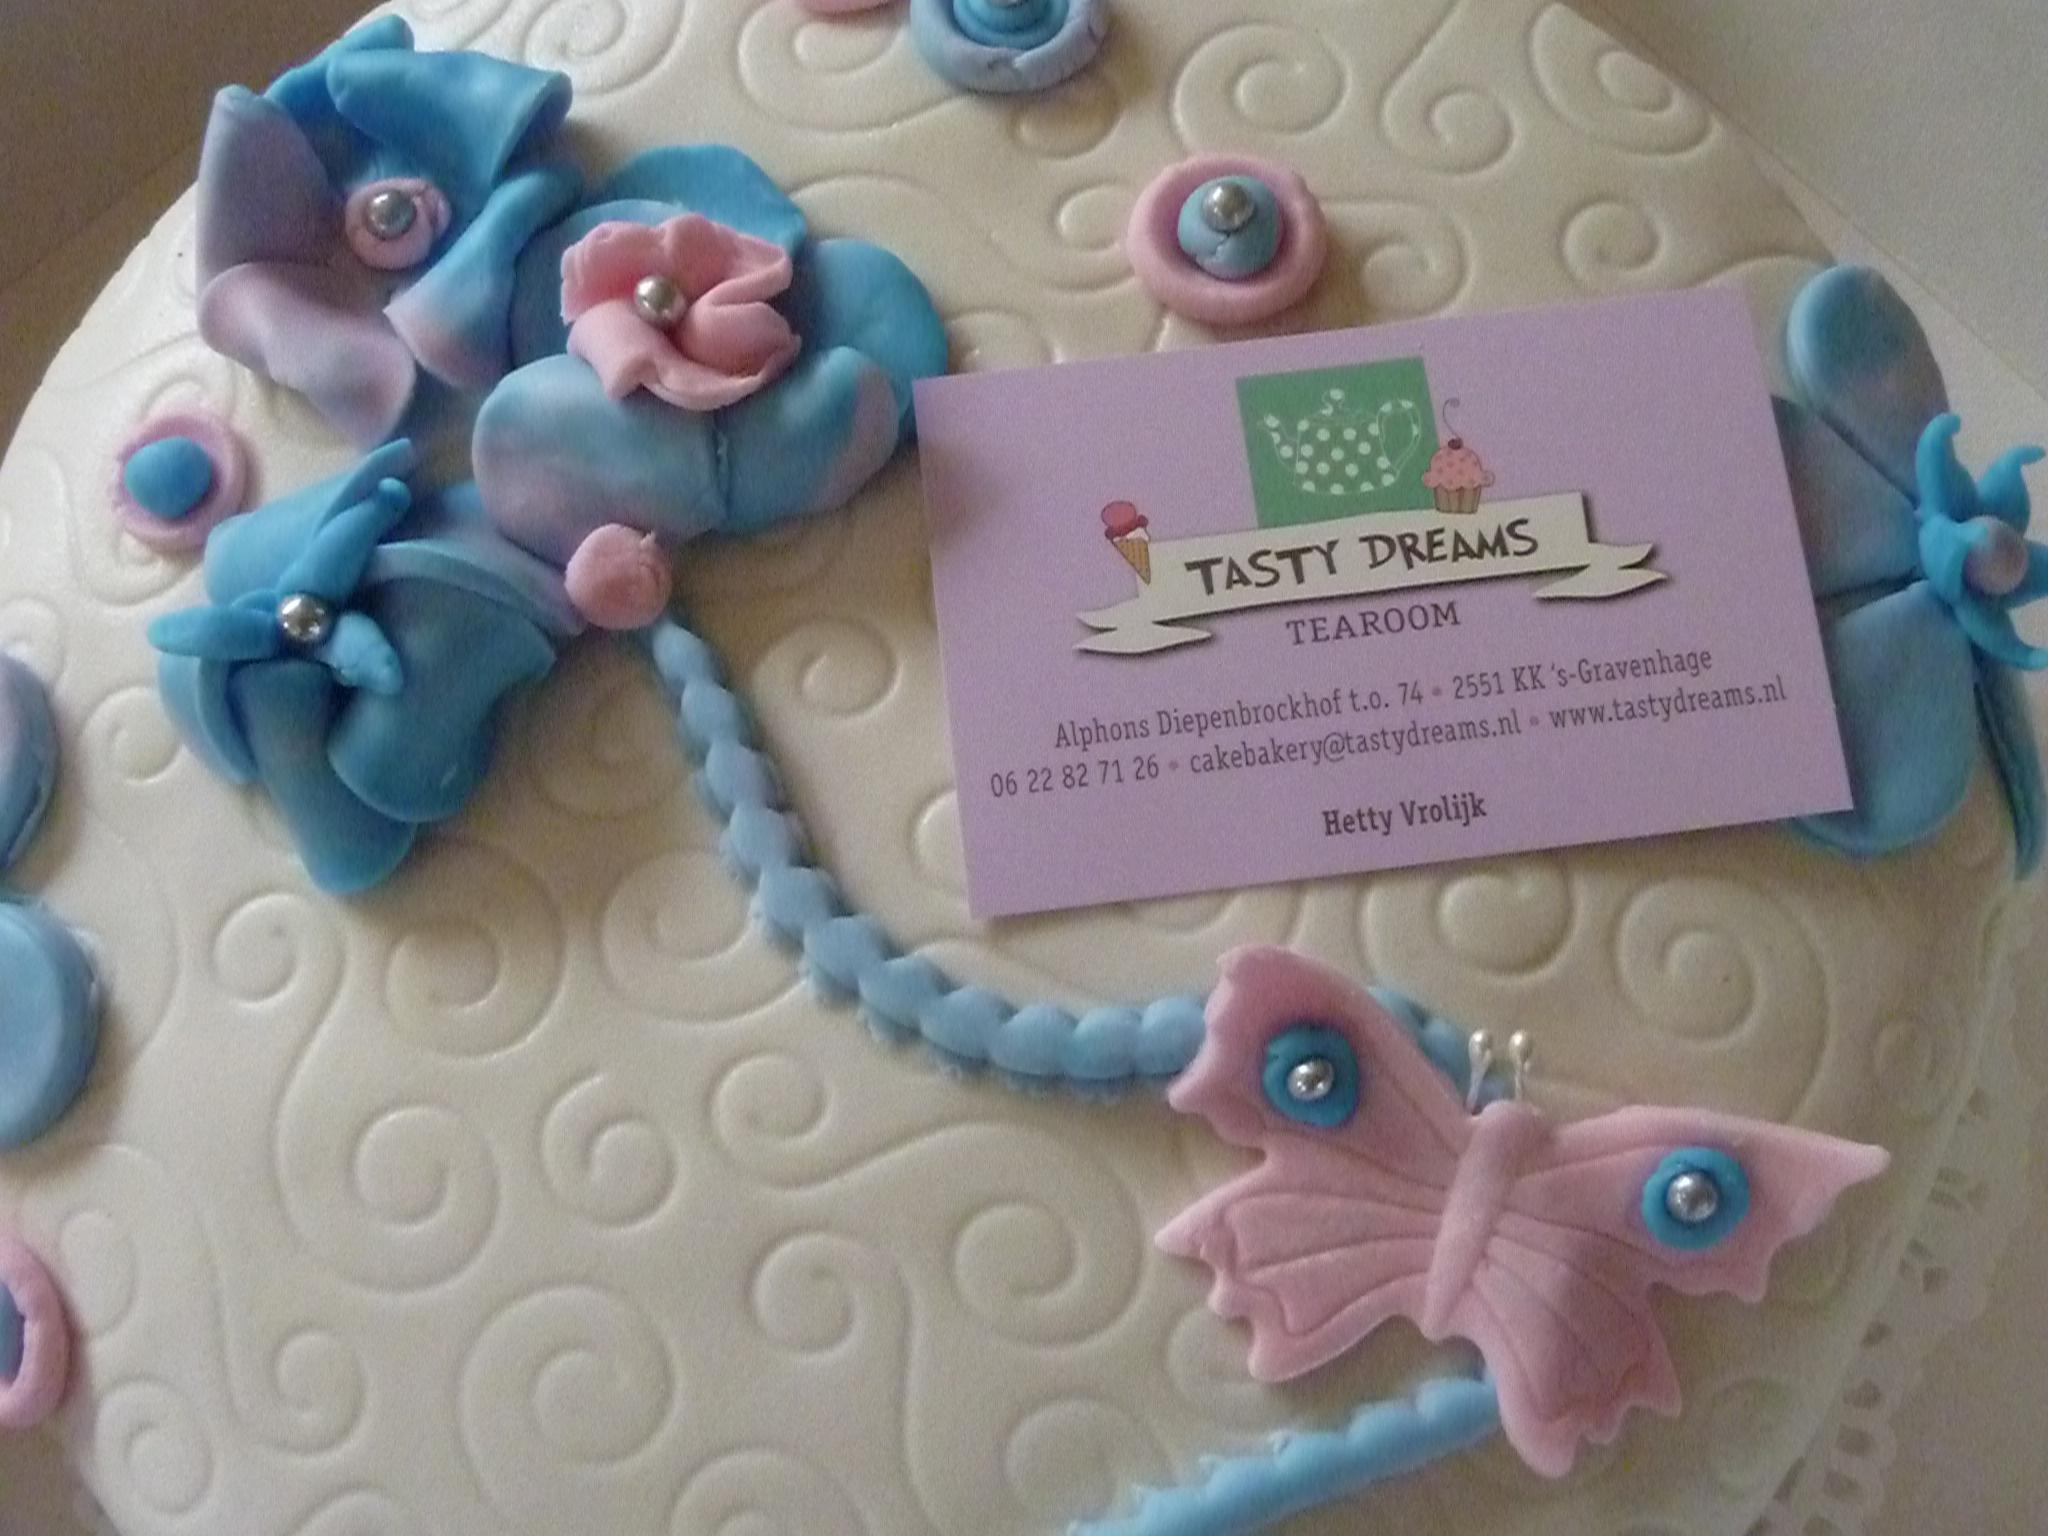 blauw-en-roze-taart